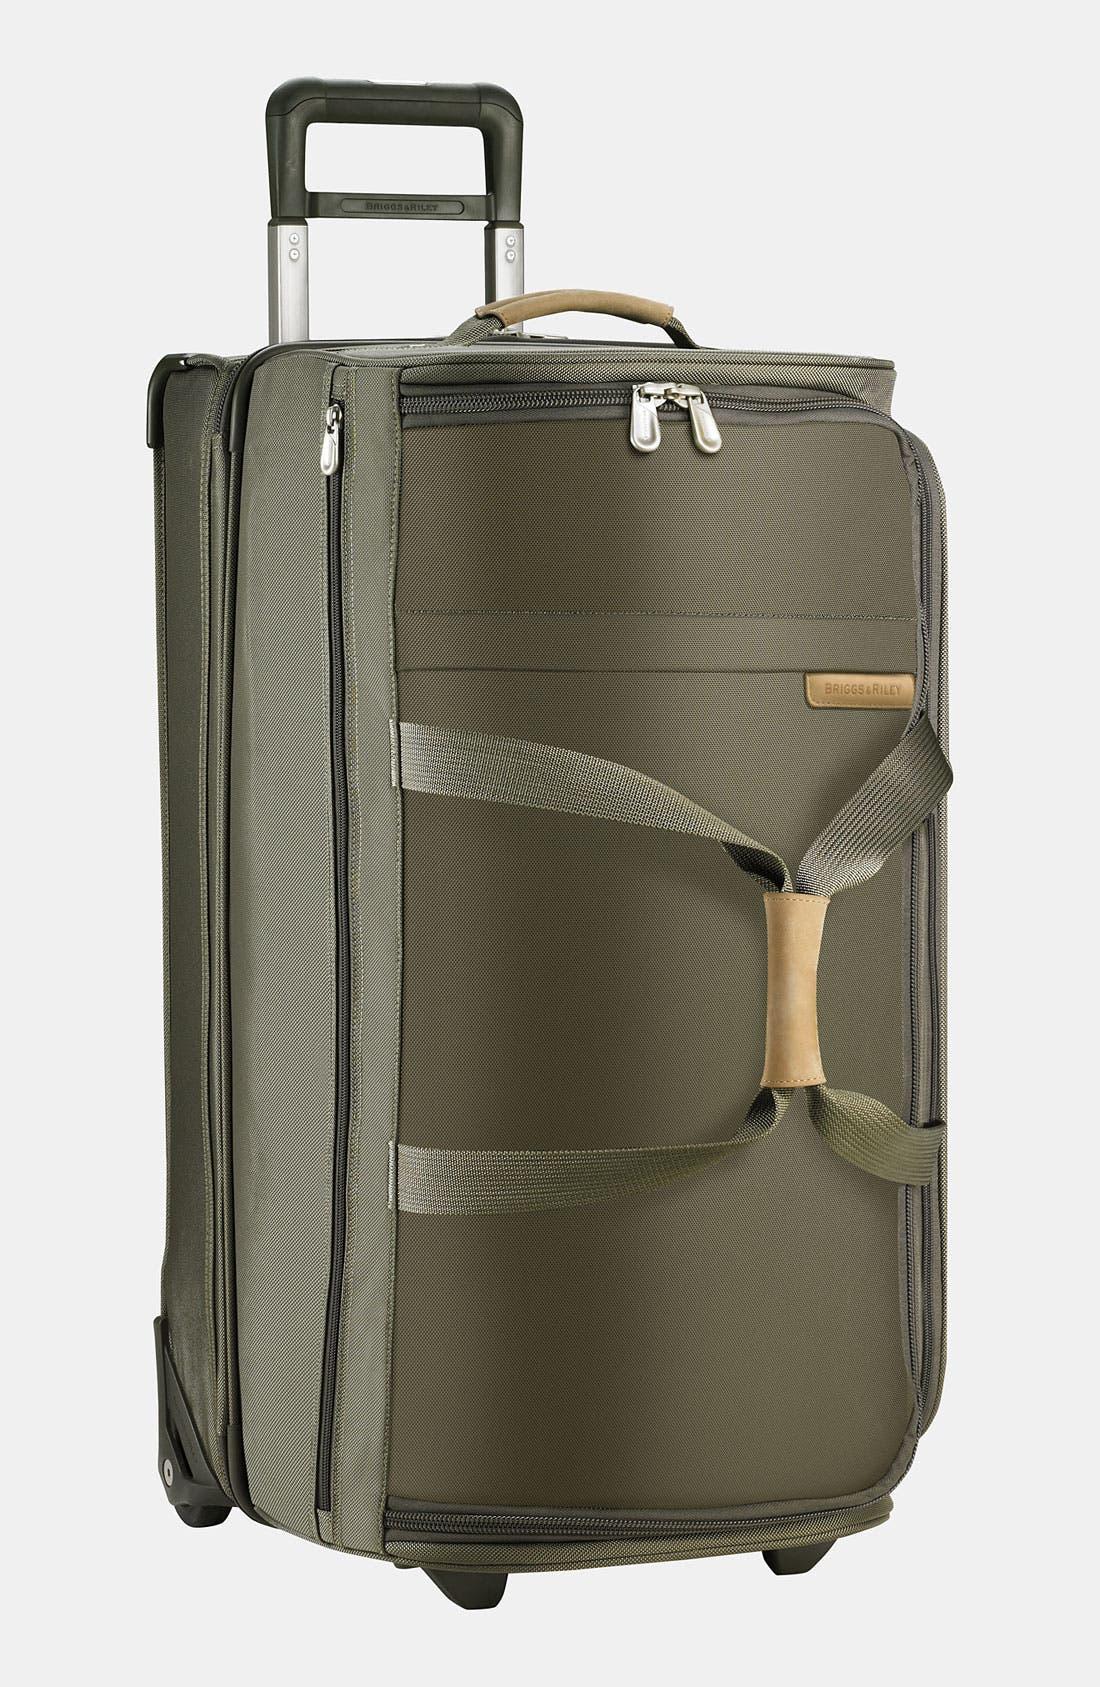 Alternate Image 1 Selected - Briggs & Riley 'Large Baseline' Rolling Duffel Bag (29 Inch)